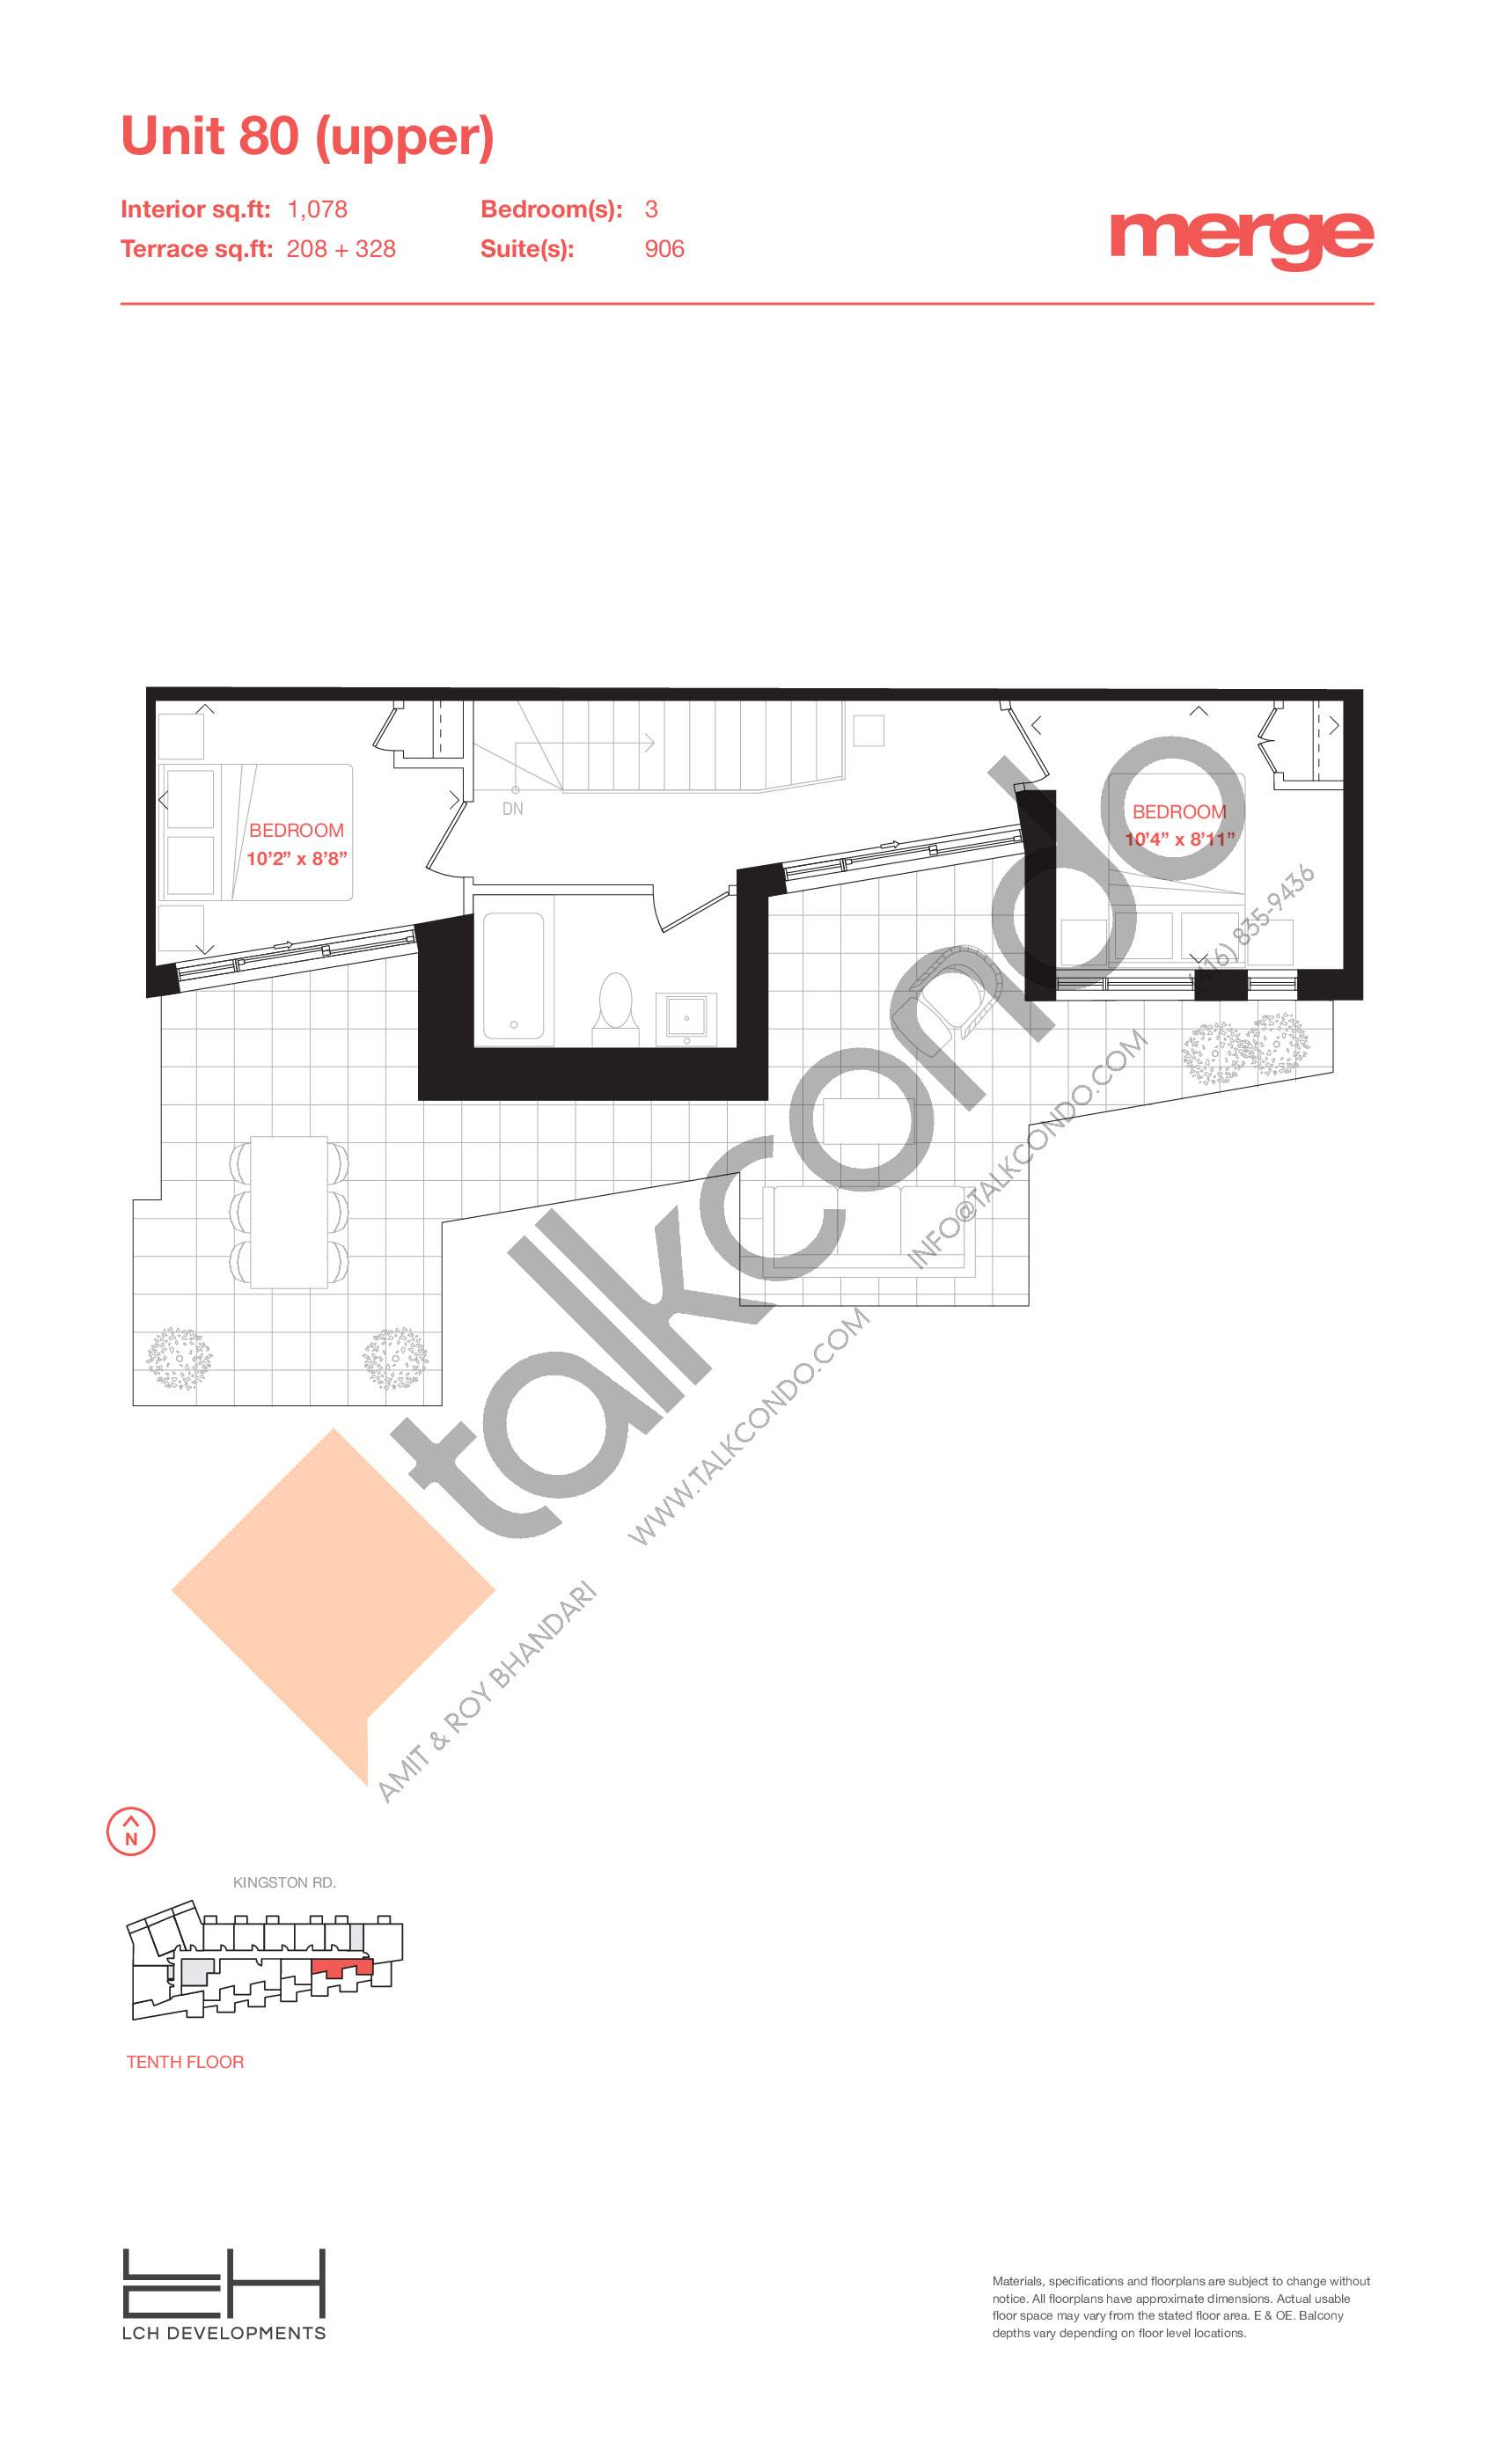 Unit 80 (Upper) - 2 Storey Floor Plan at Merge Condos - 1078 sq.ft